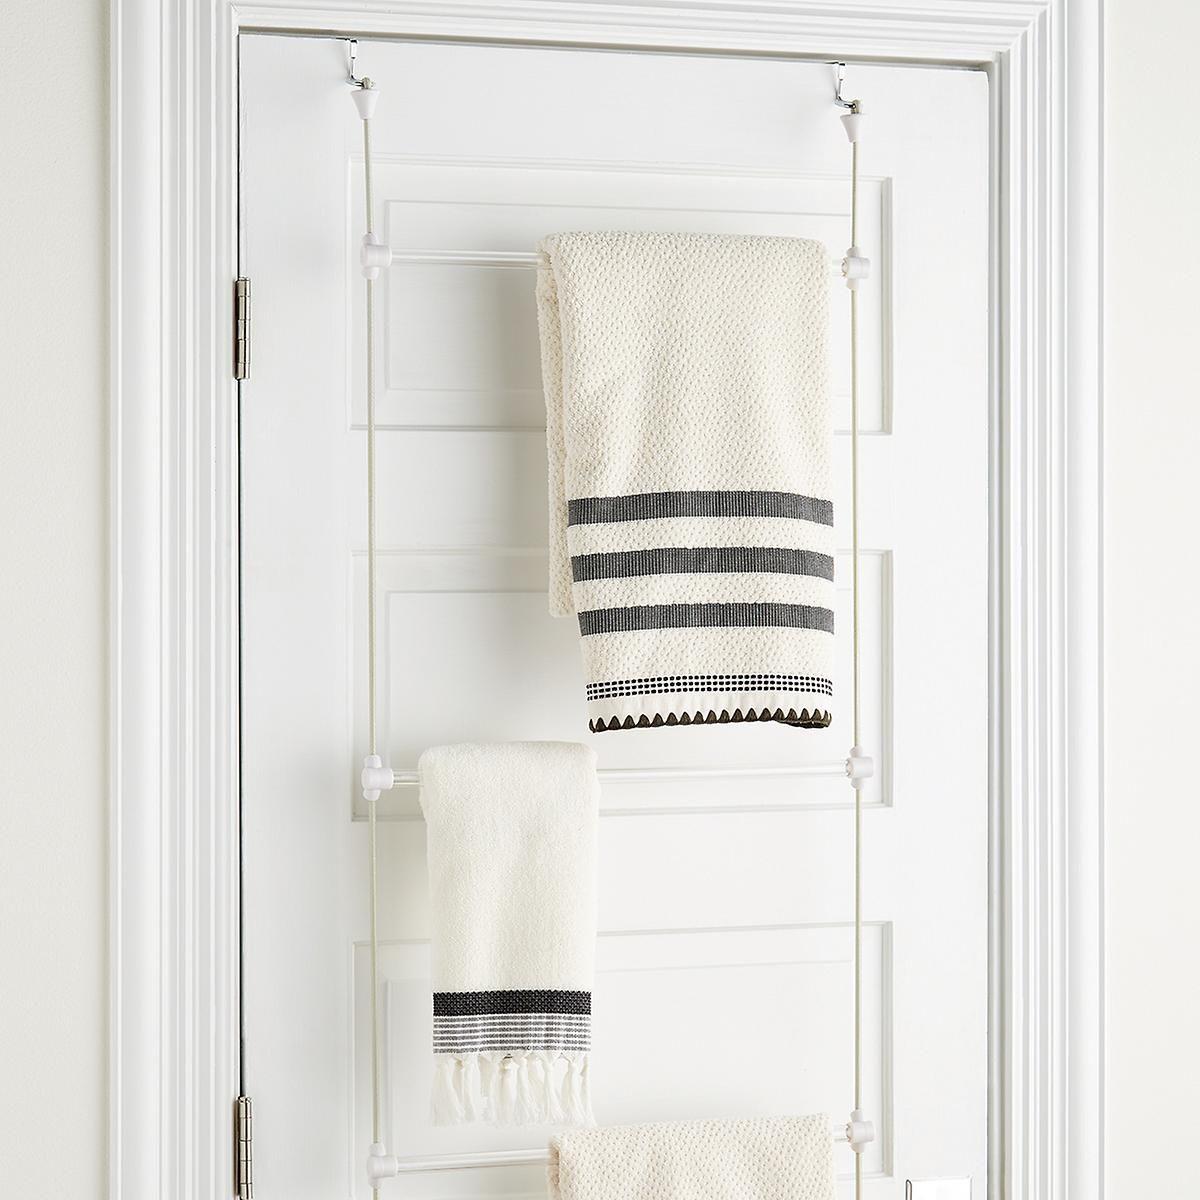 Umbra Bungee Over The Door Towel Rack With Images Small Bathroom Storage Bathroom Organisation Bathroom Storage Organization